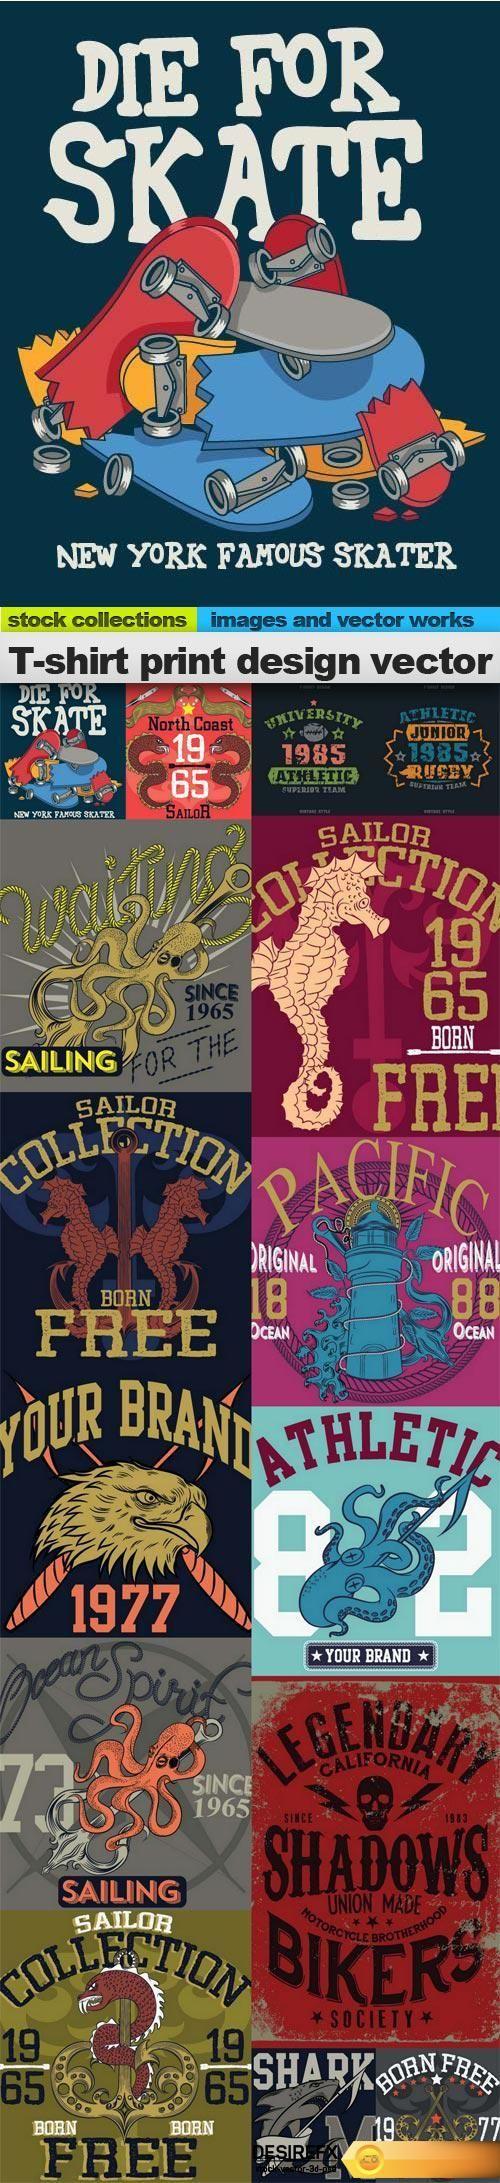 Shirt design eps - T Shirt Print Design Vector 15 X Eps Http Www